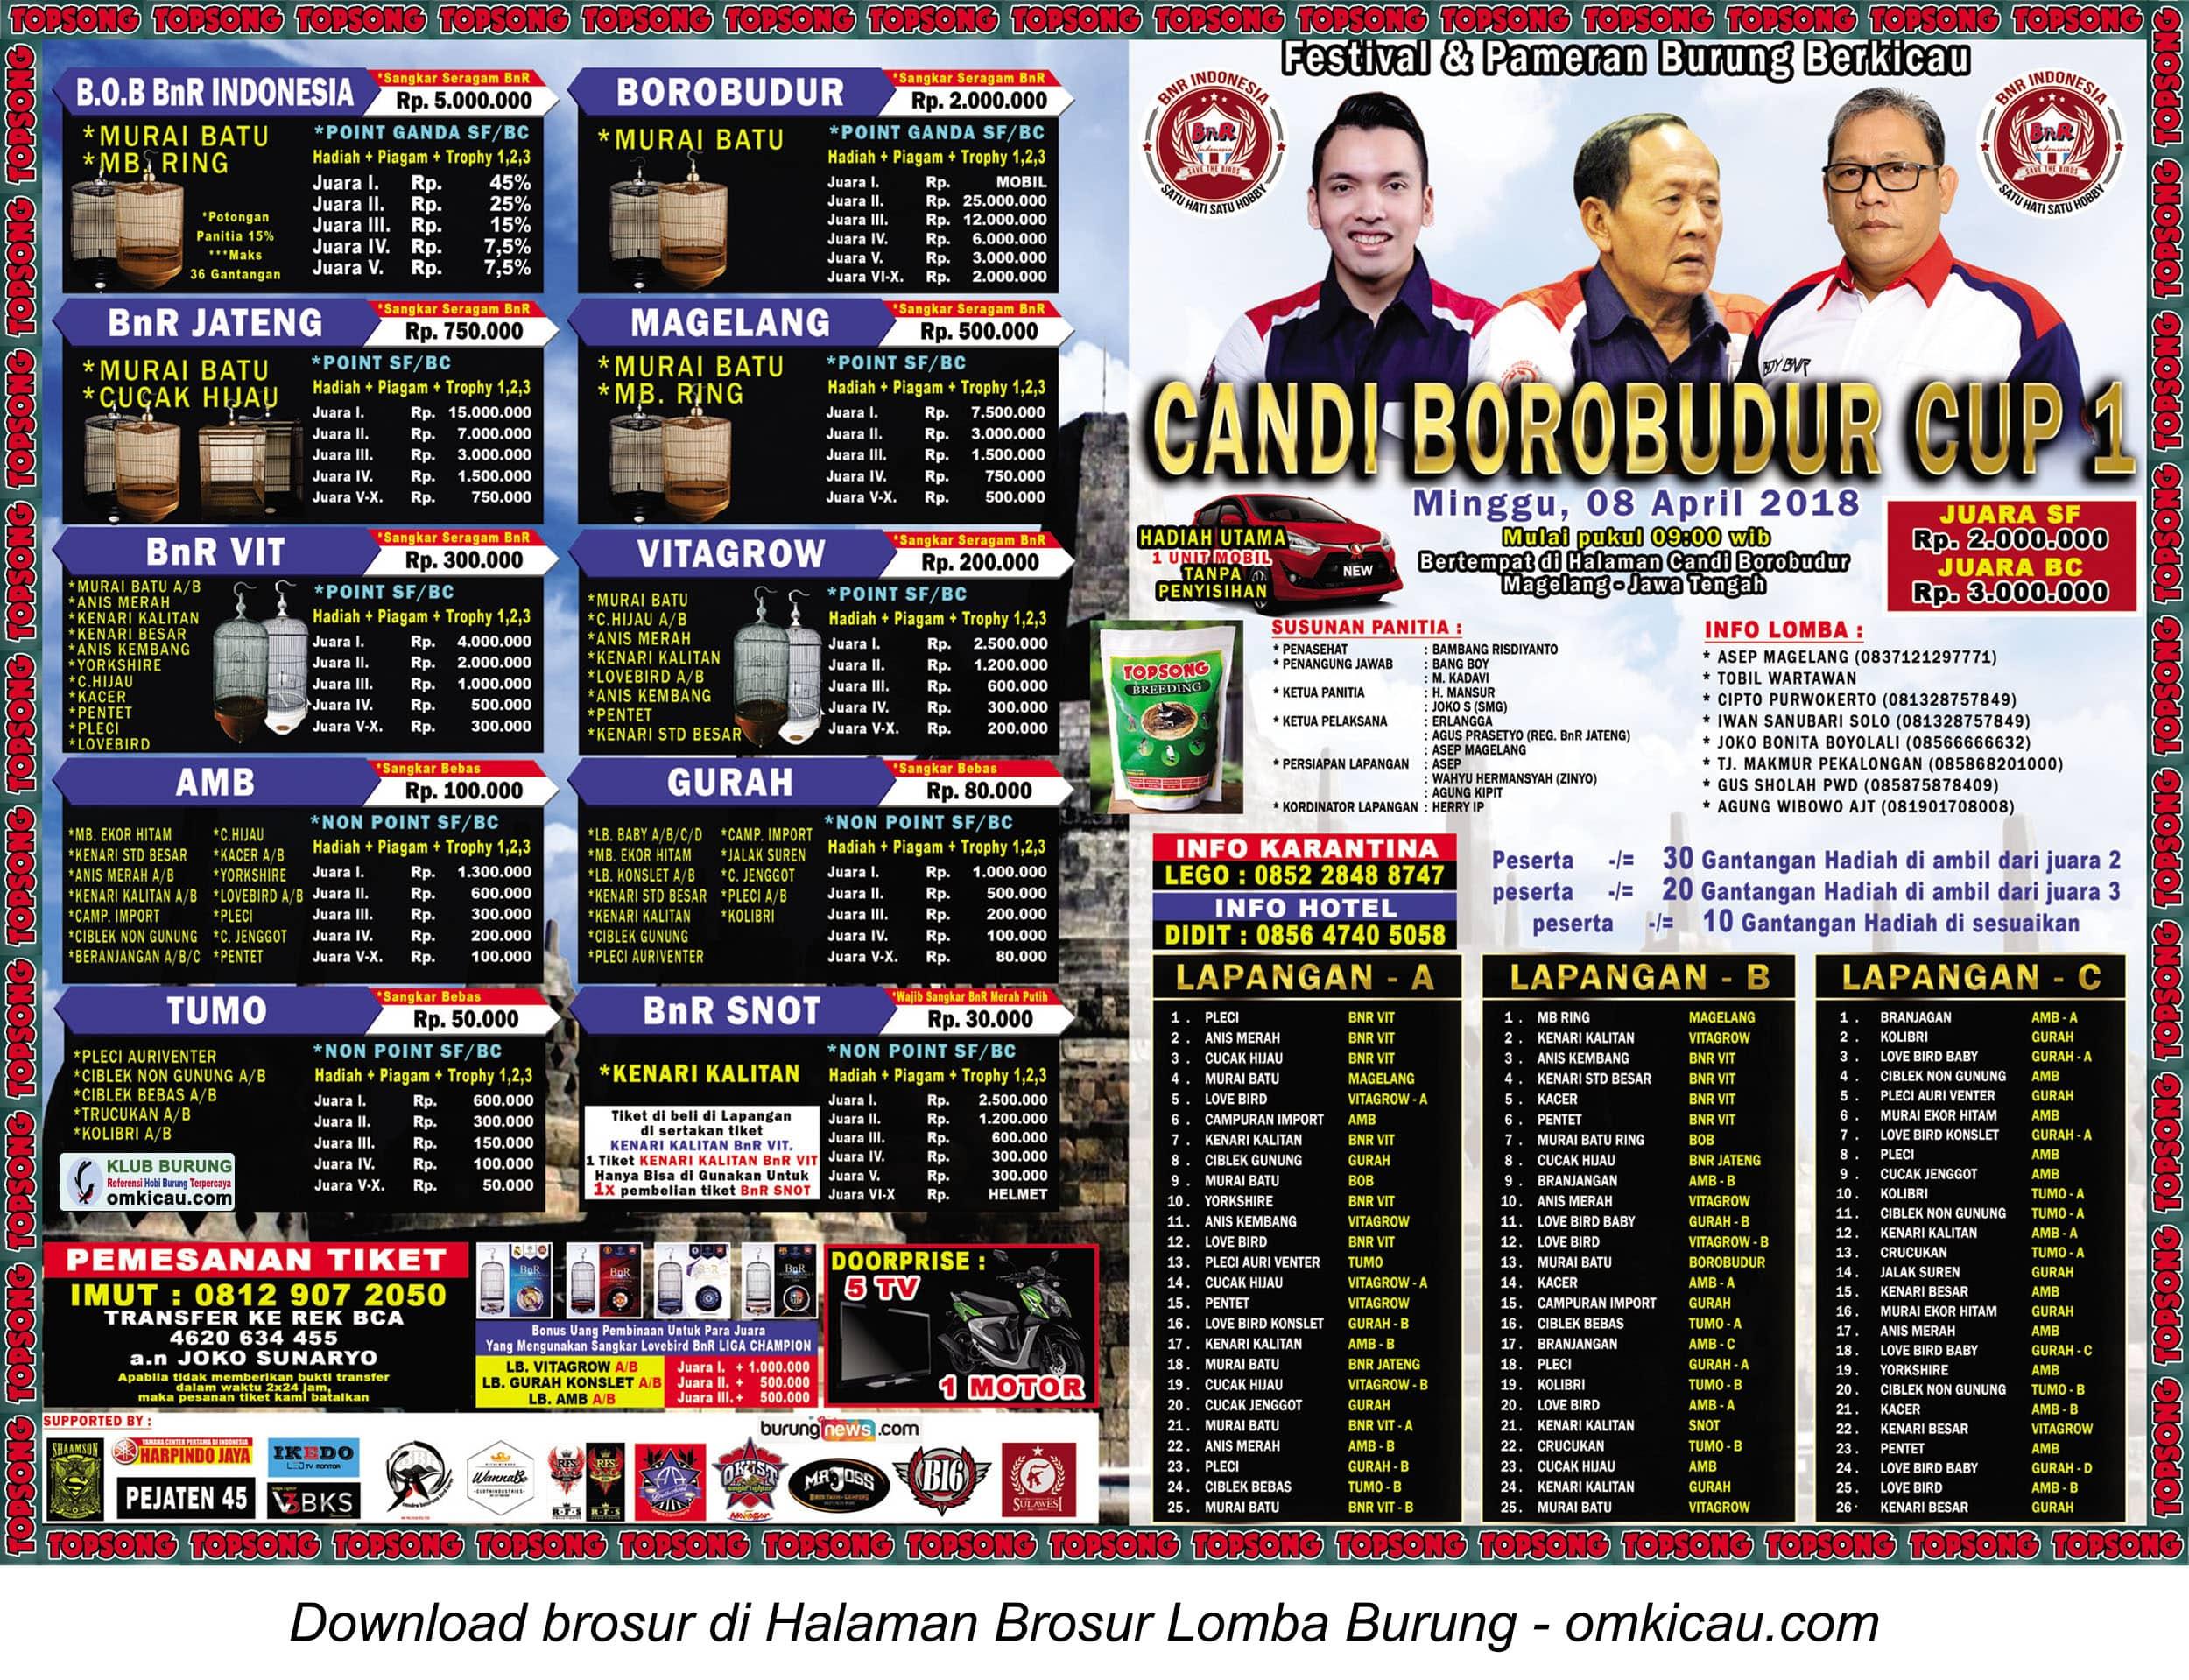 Candi Borobudur Cup 1